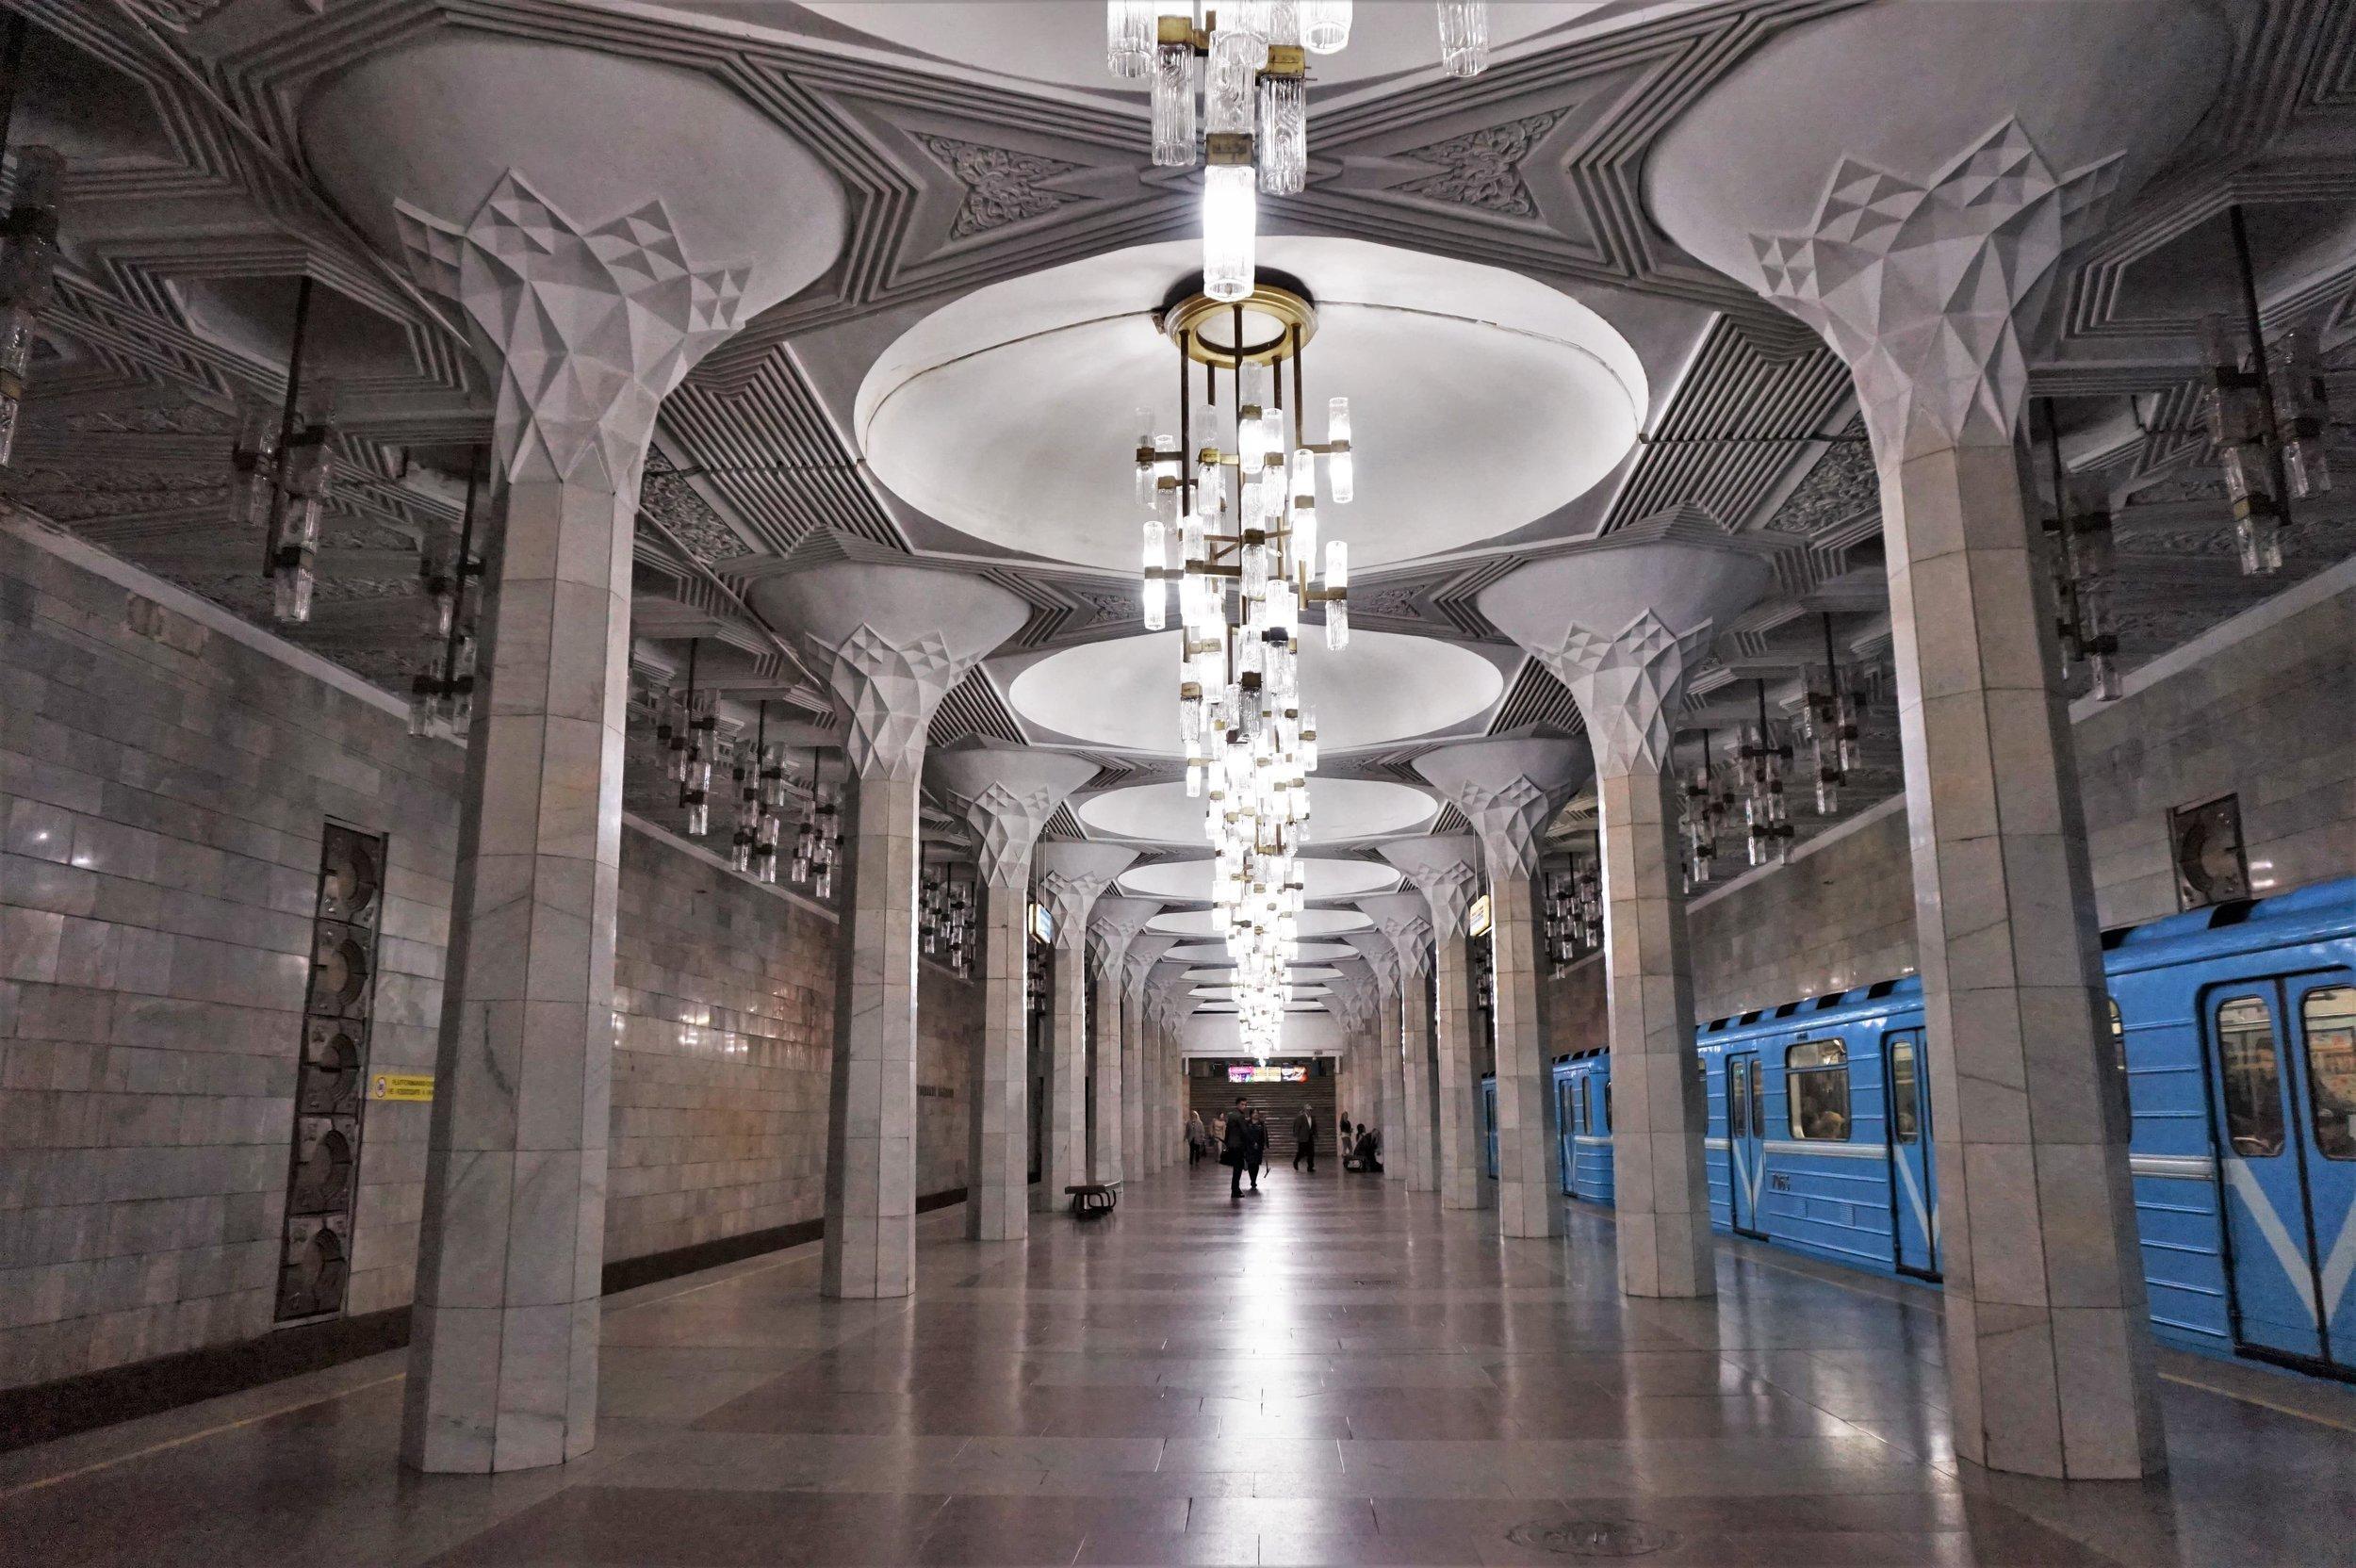 Metro stations Tashkent, Uzbekistan